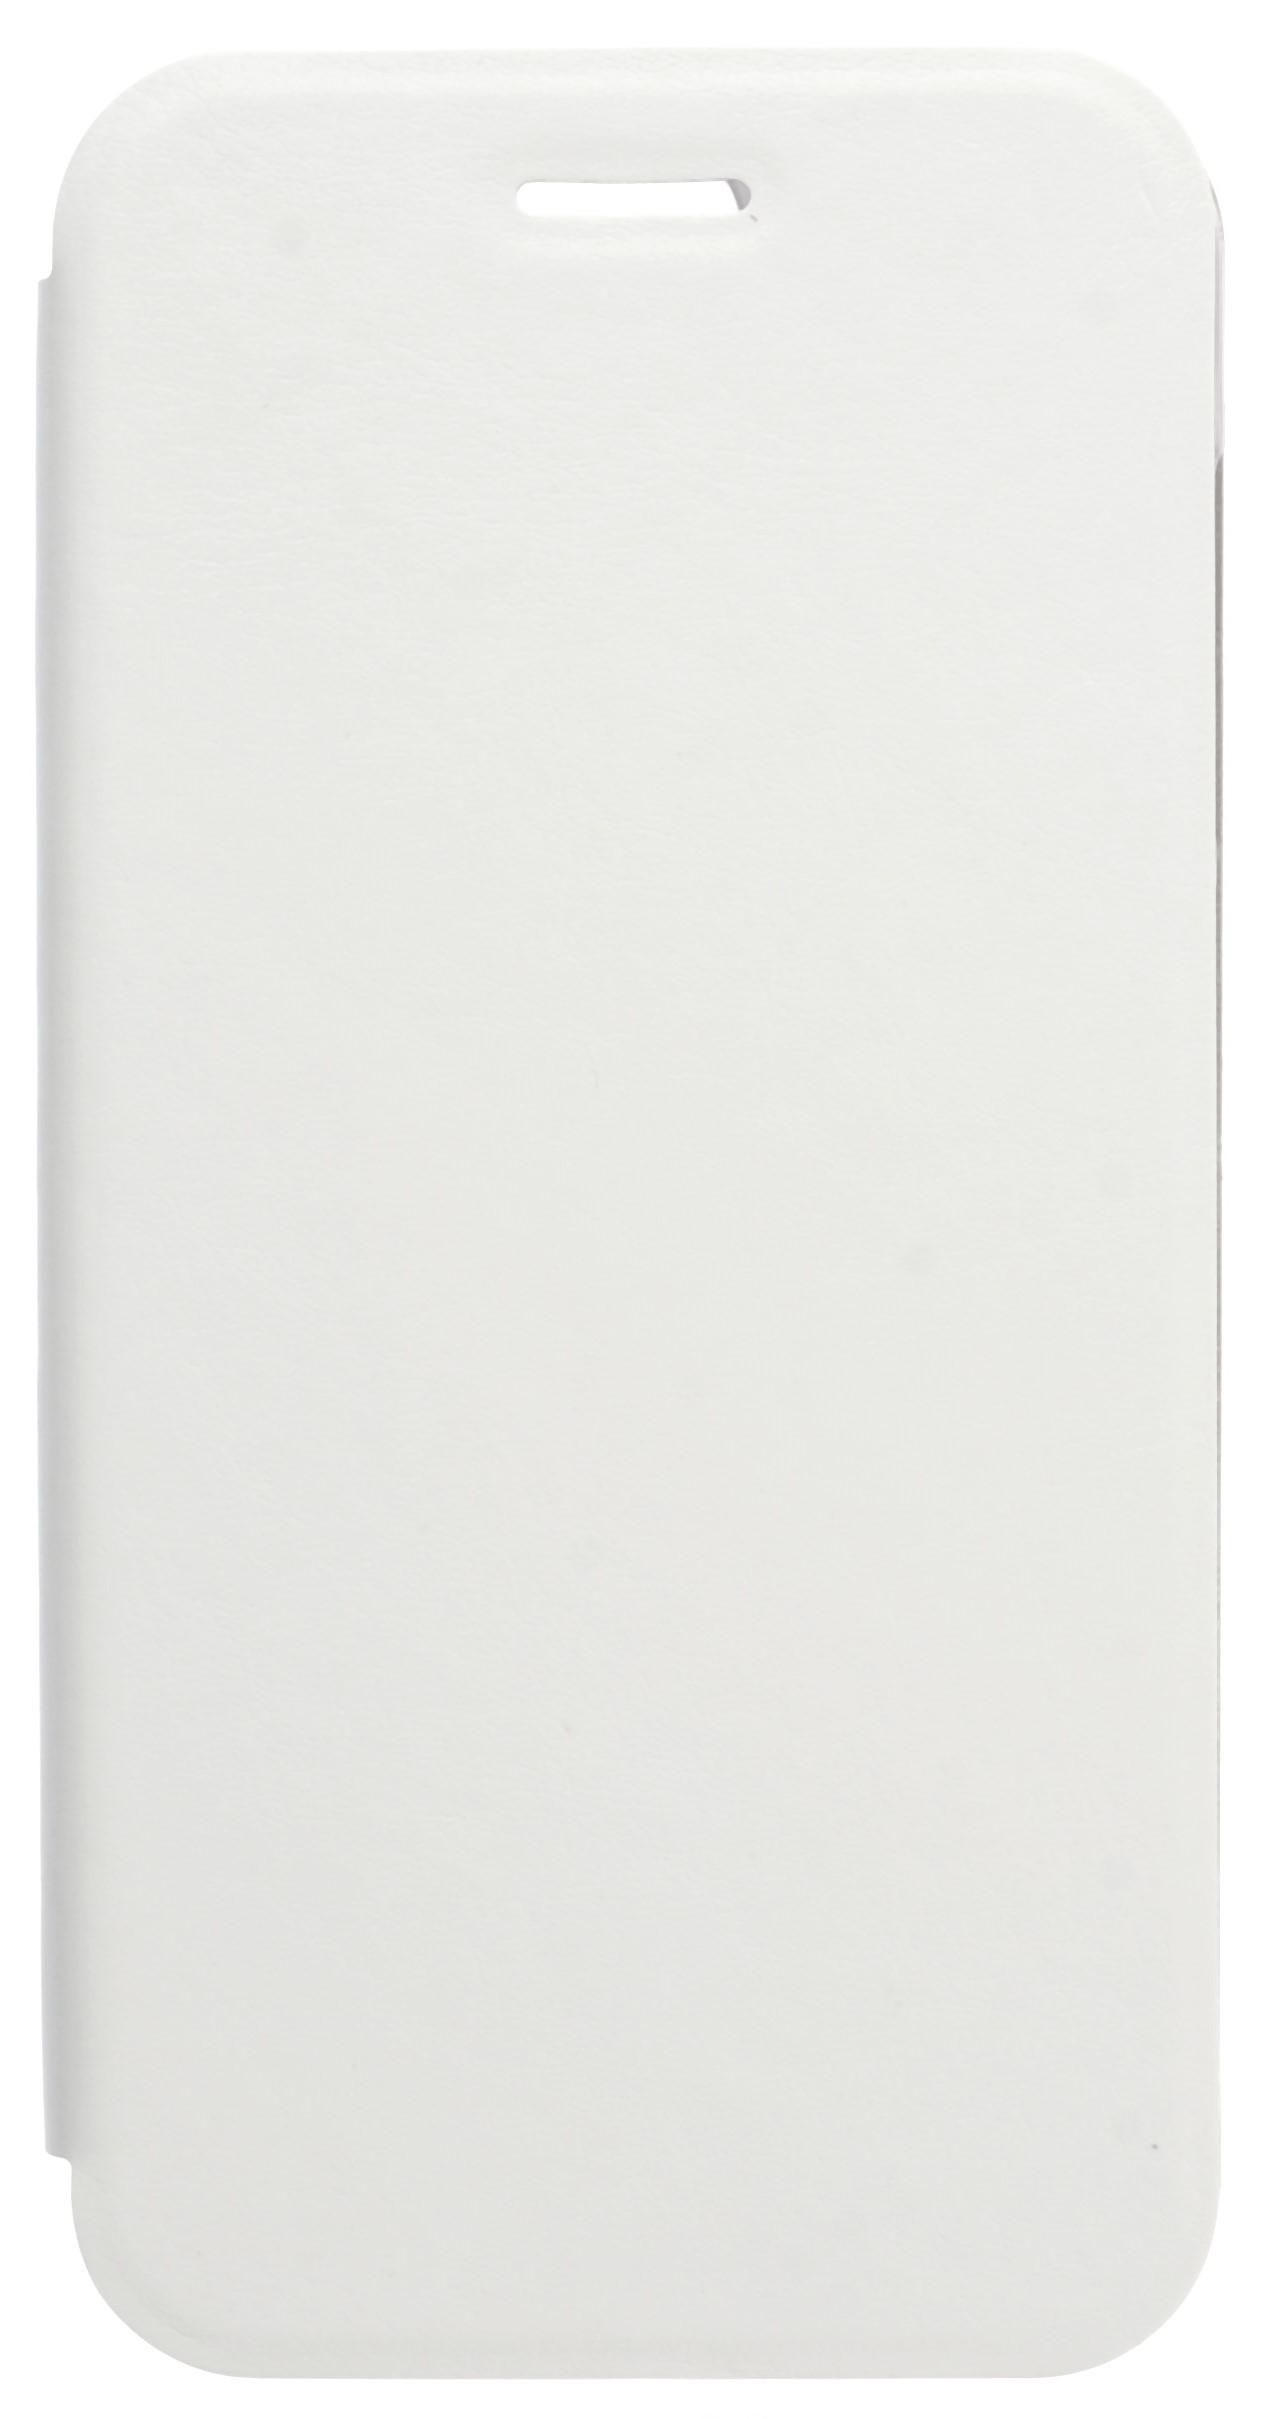 Чехол для сотового телефона skinBOX Lux, 4630042527645, белый nokia cc 3096 чехол для lumia 435 532 bright green